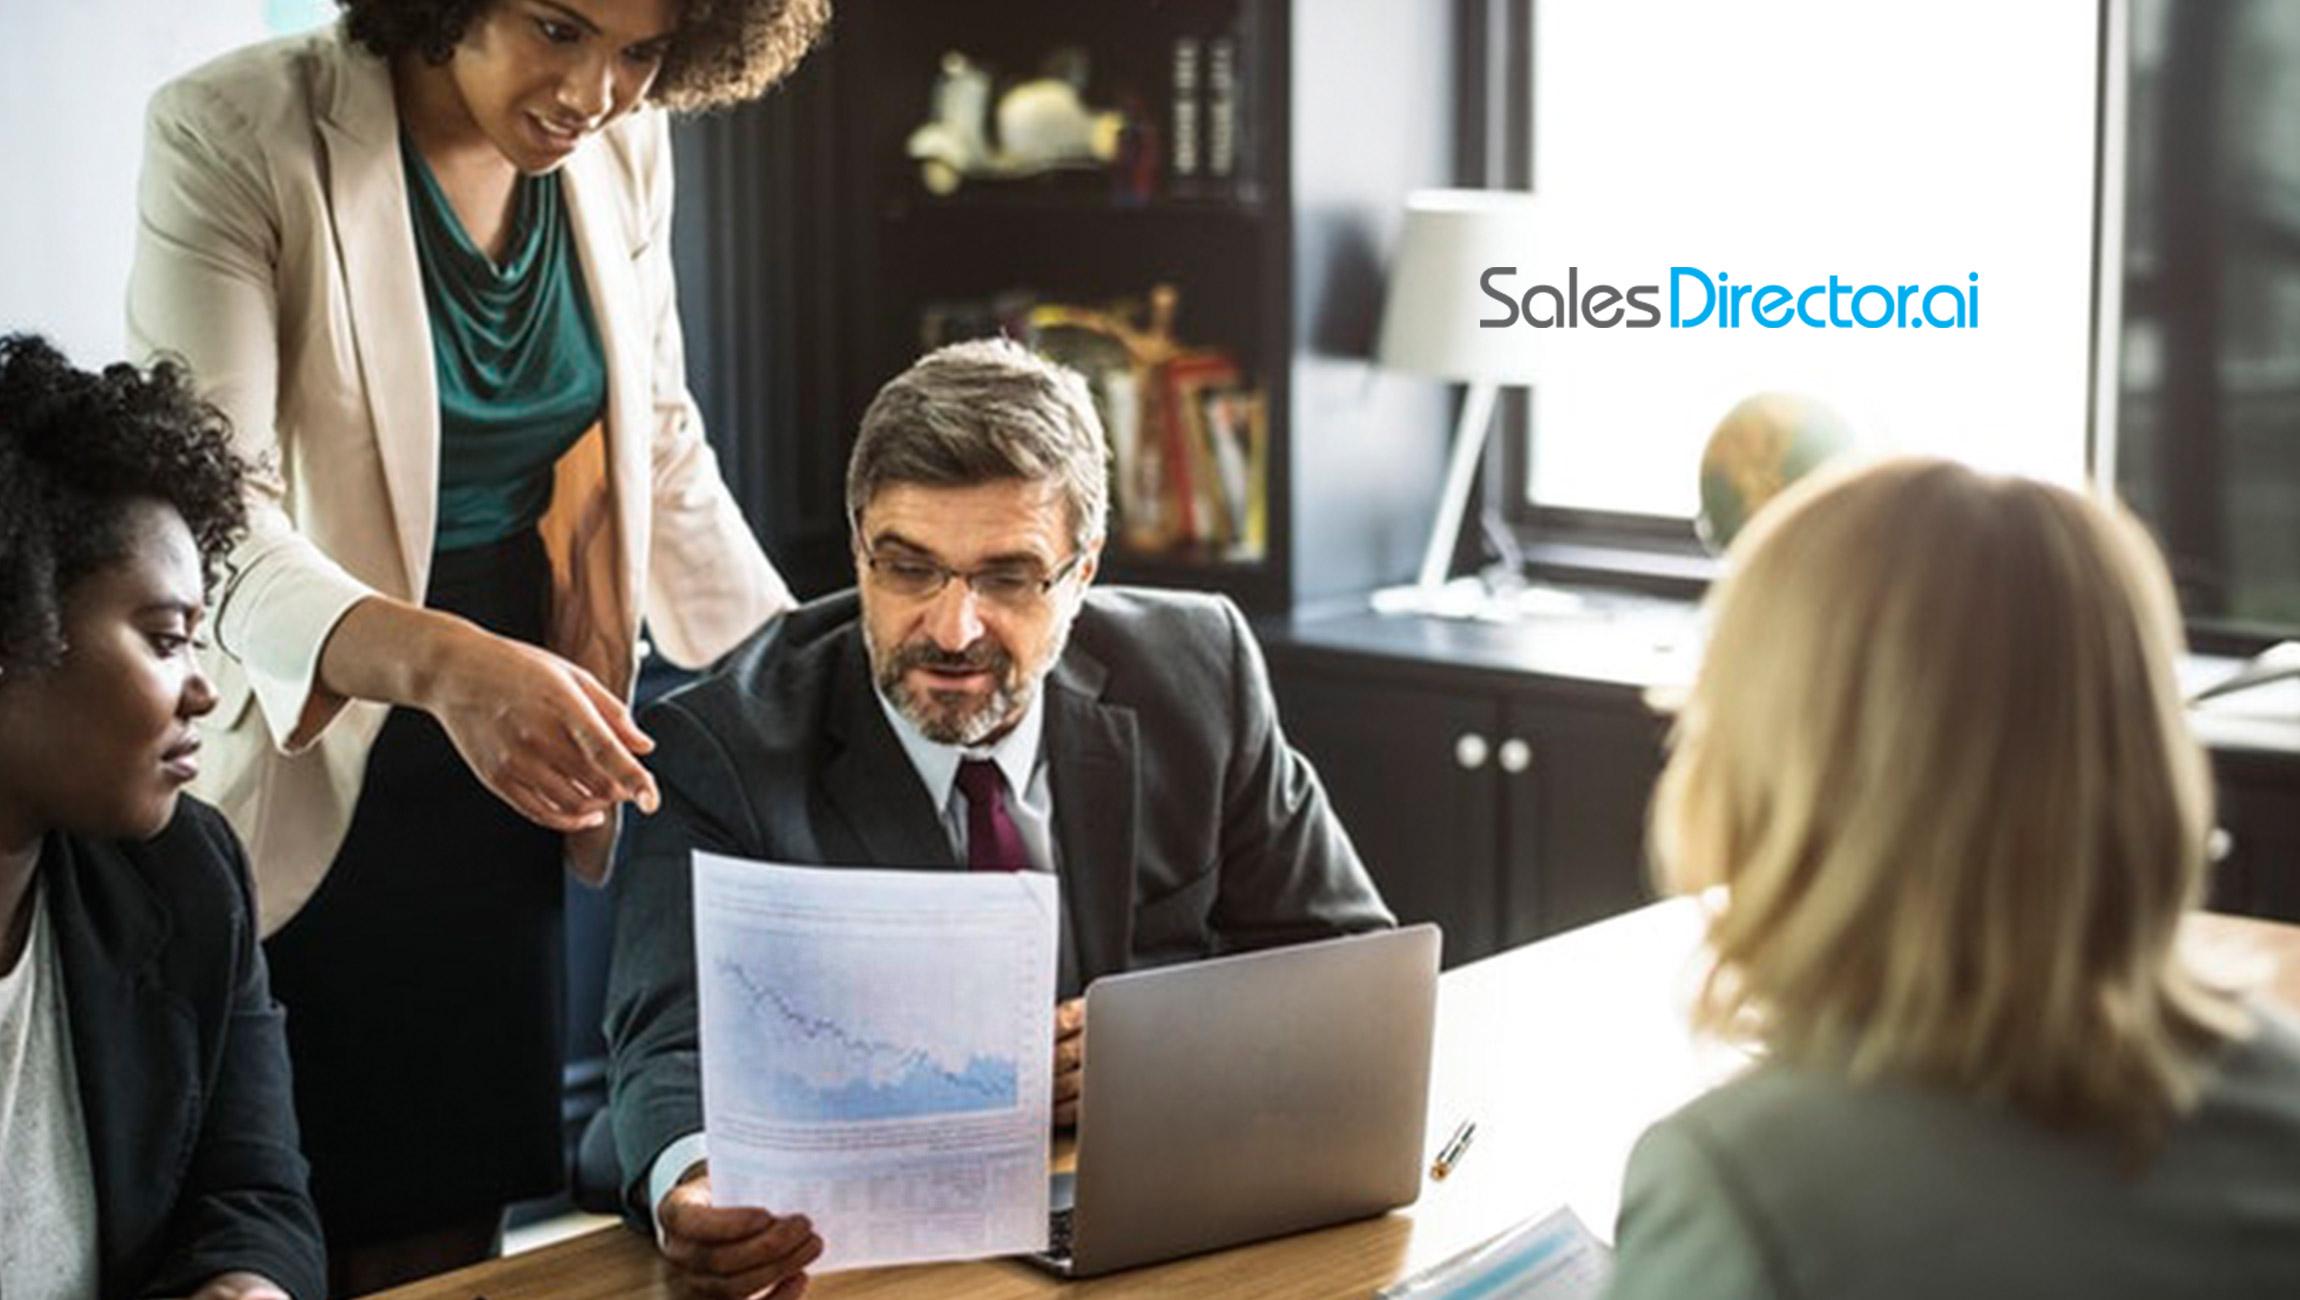 SalesDirector.ai